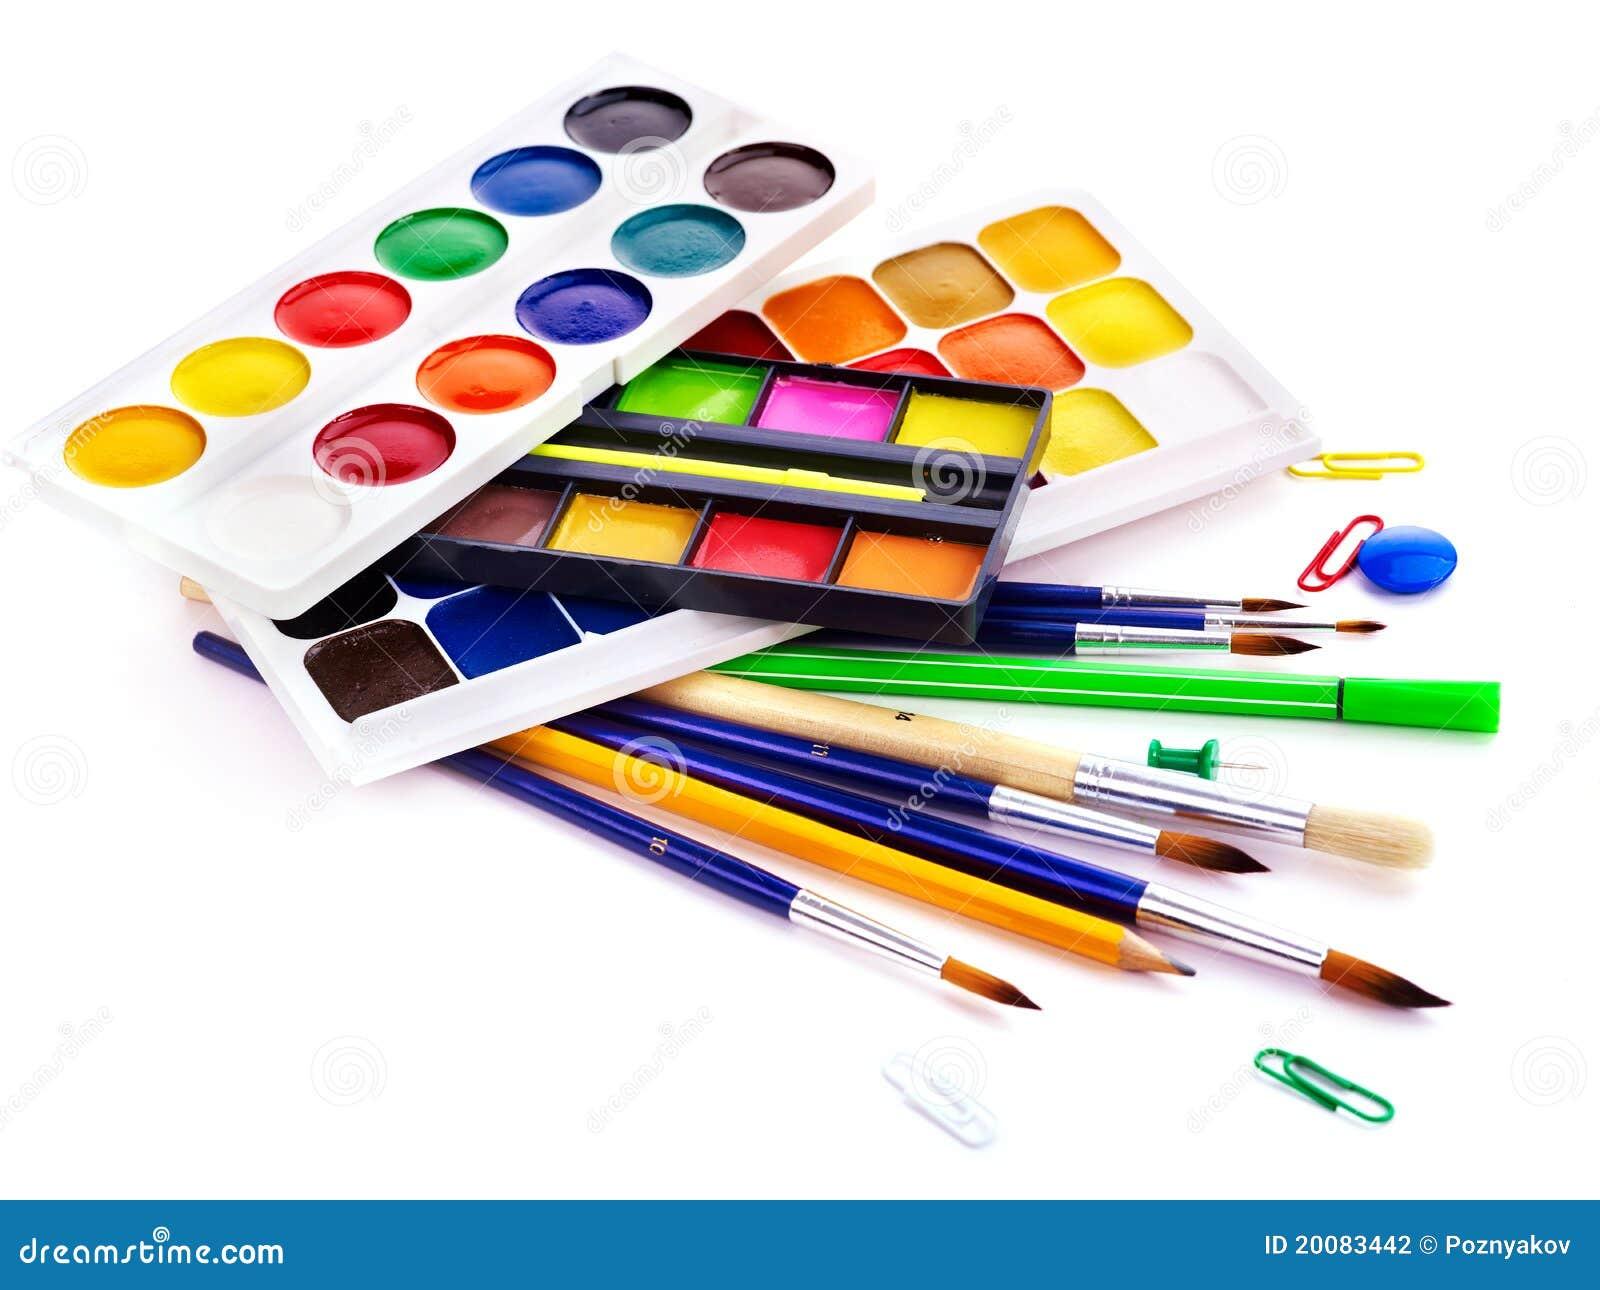 School Art Supplies Stock Photography - Image: 20083442